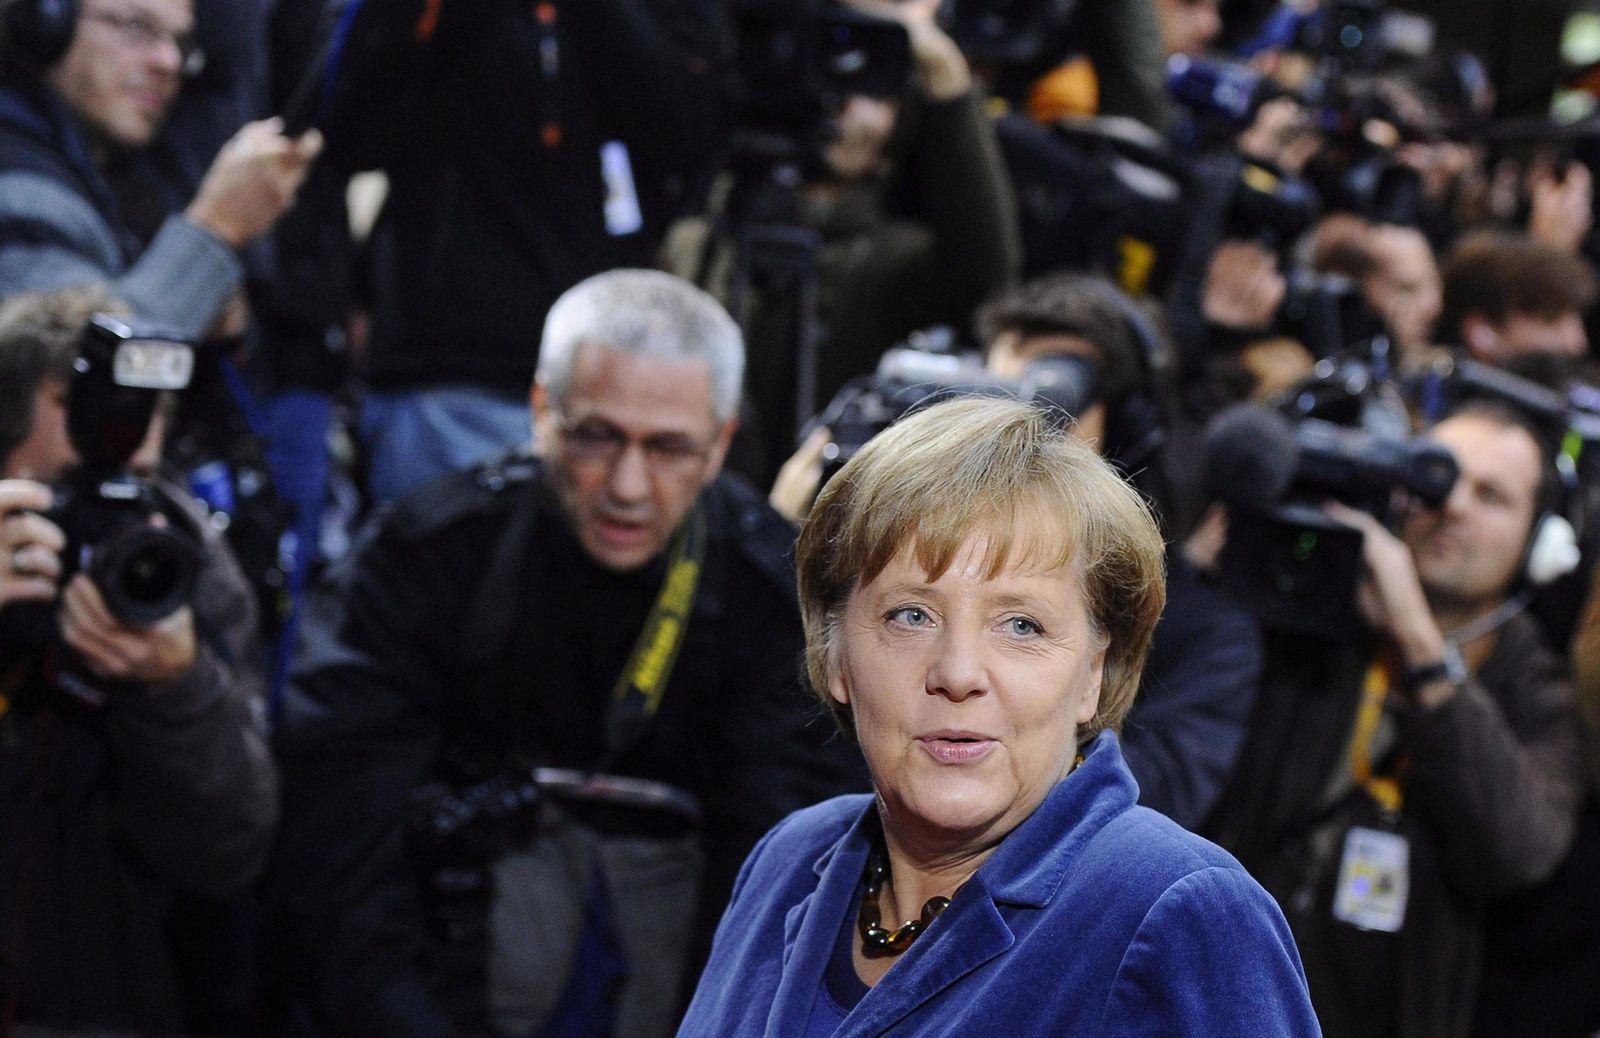 Angela Merkel, Brüsseler EU-Gipfel